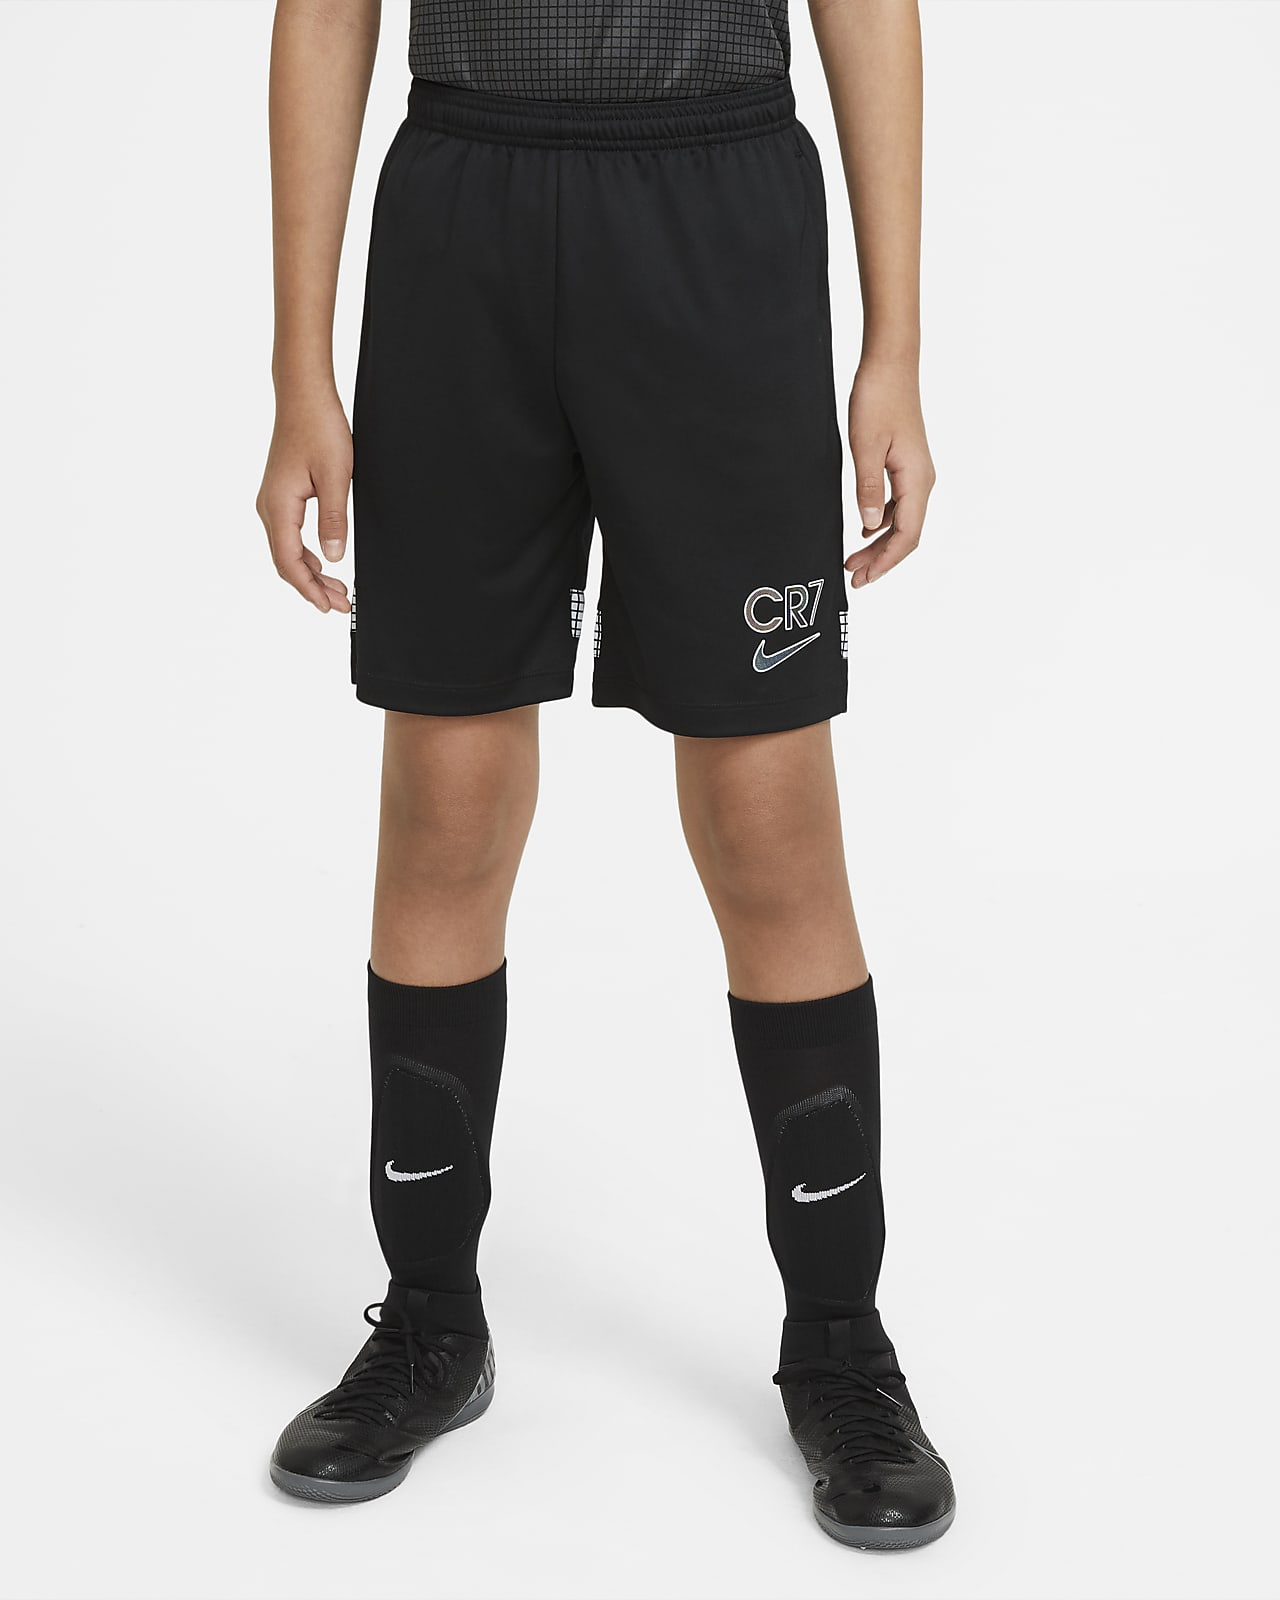 Shorts de fútbol tejidos para niños talla grande Nike Dri-FIT CR7